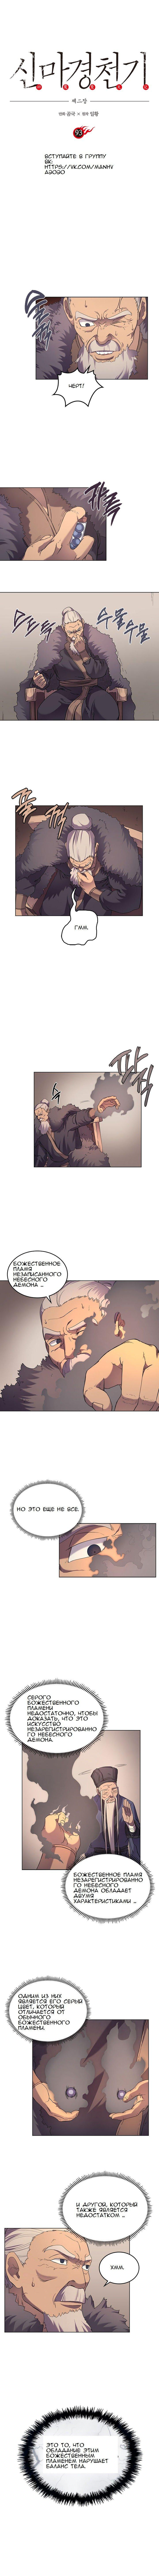 Манга Хроники Святого Демона - Глава 93 Страница 1